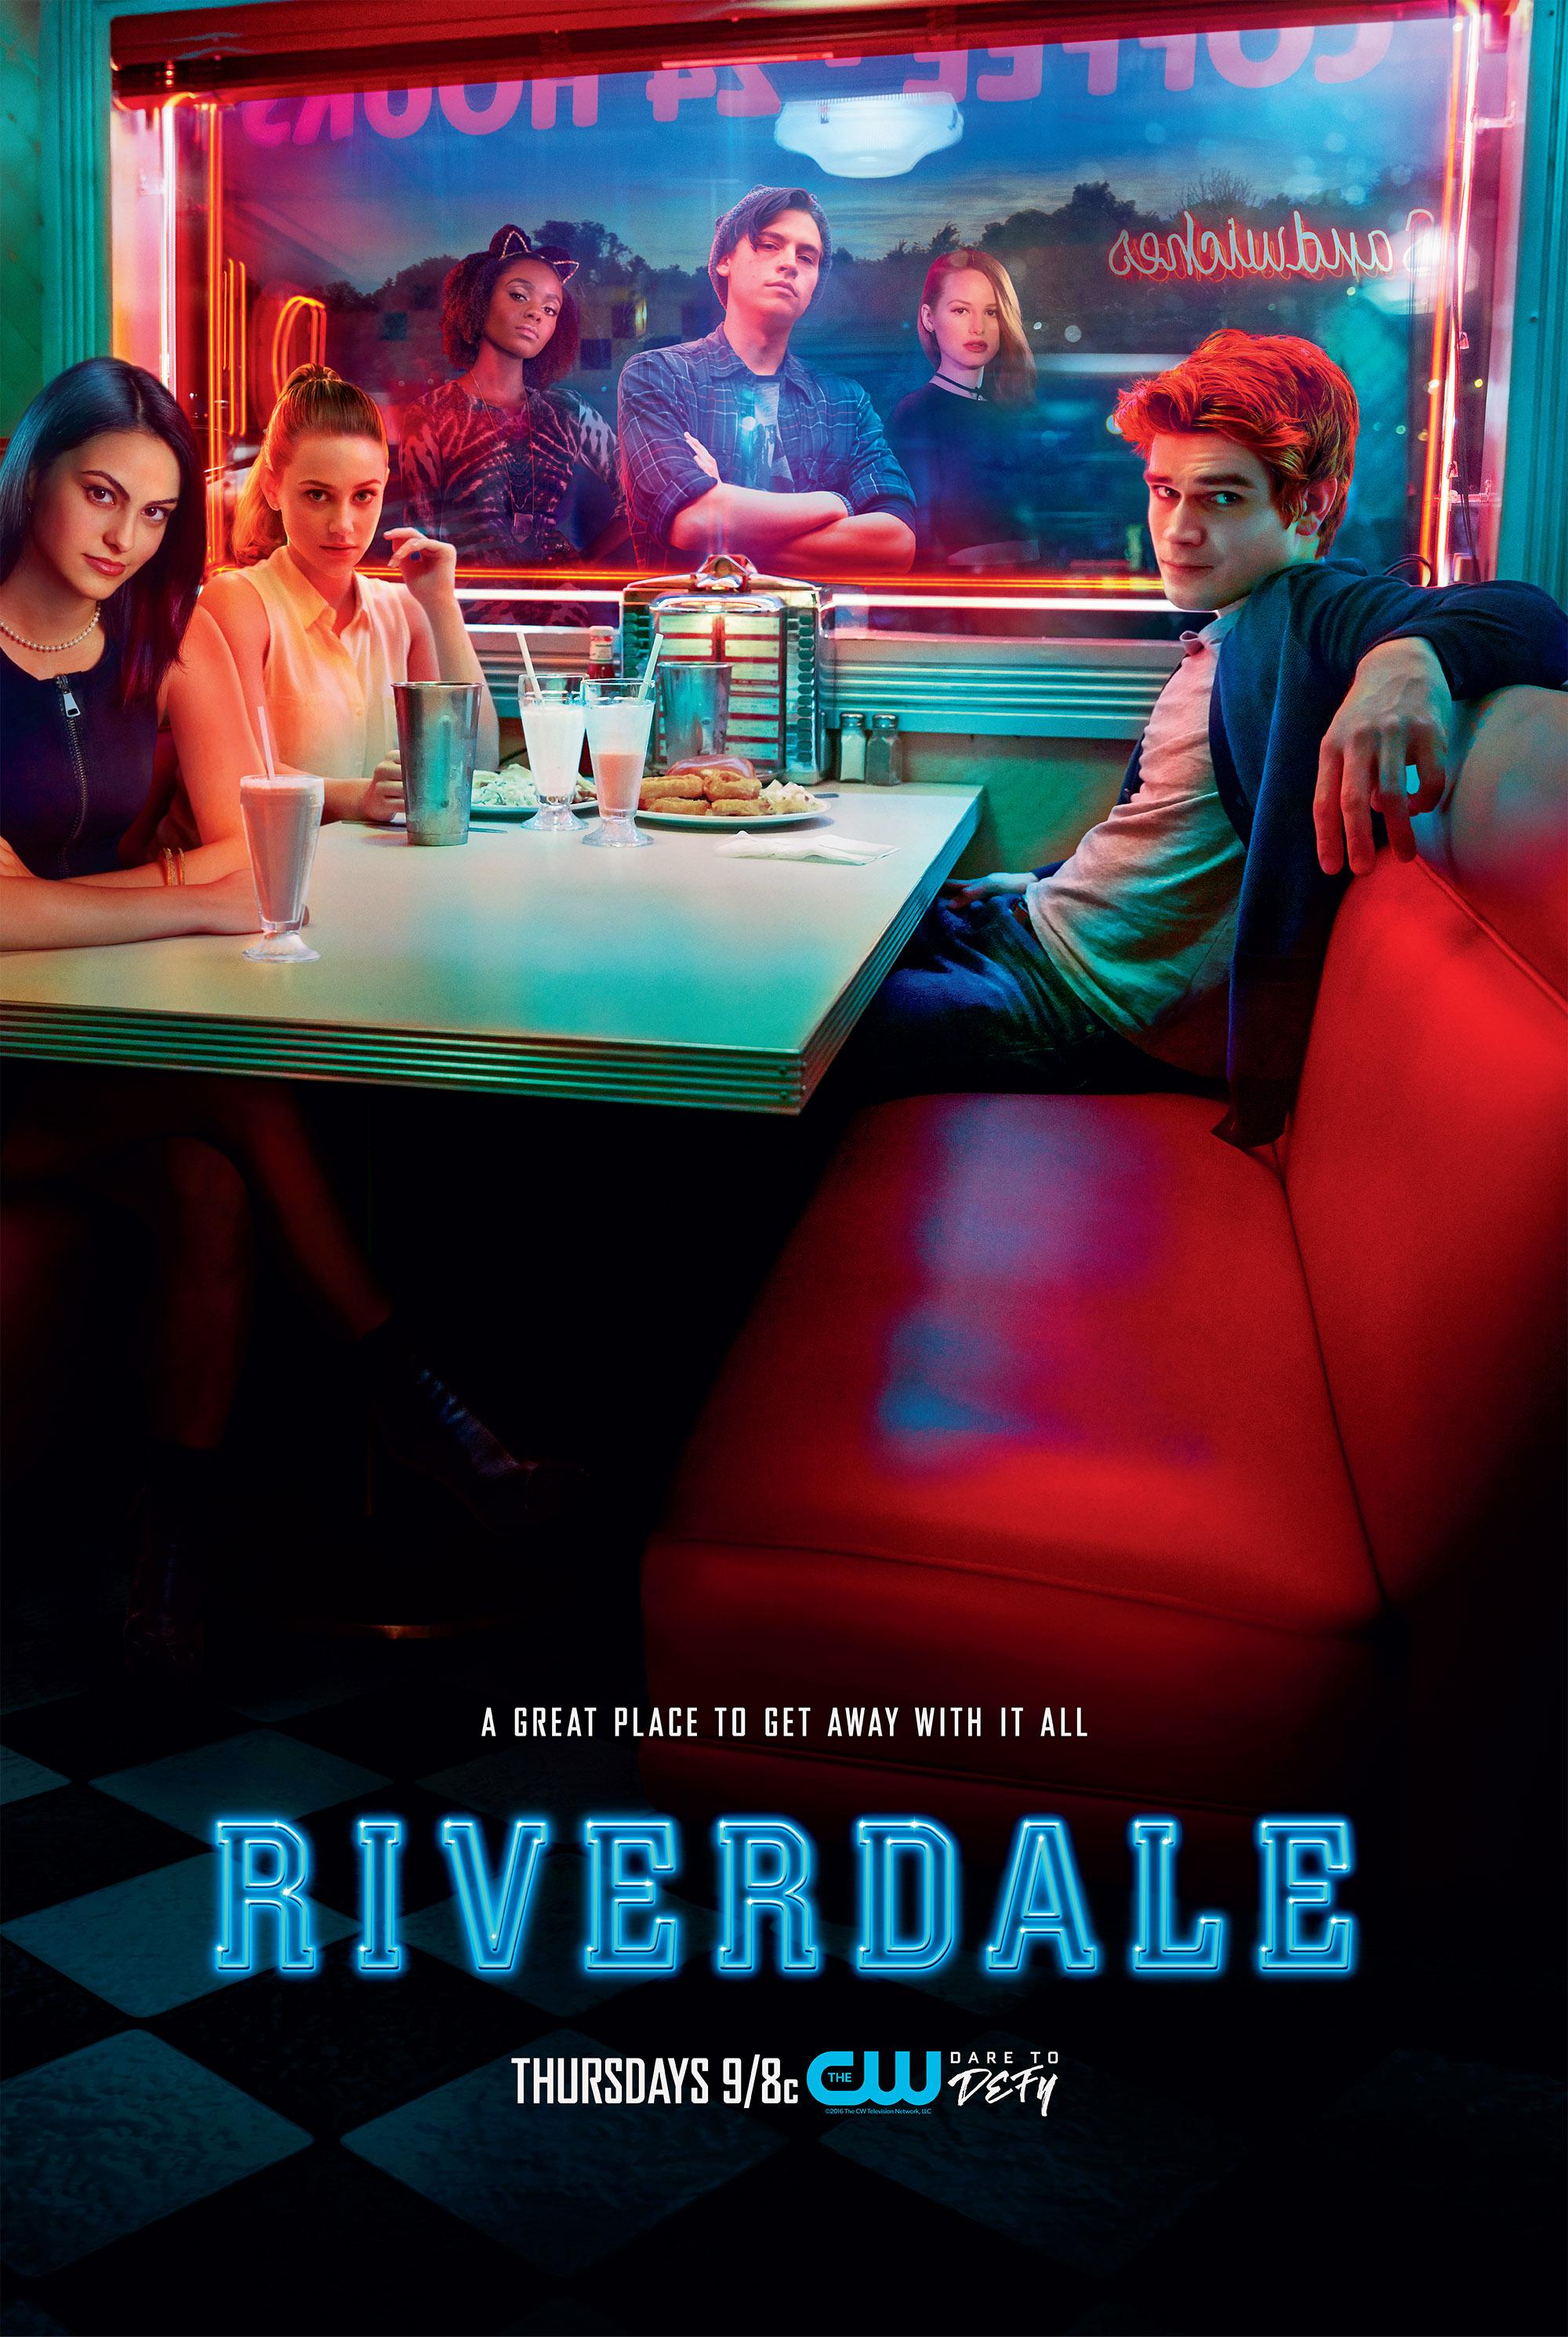 XYZ CWTV Riverdale